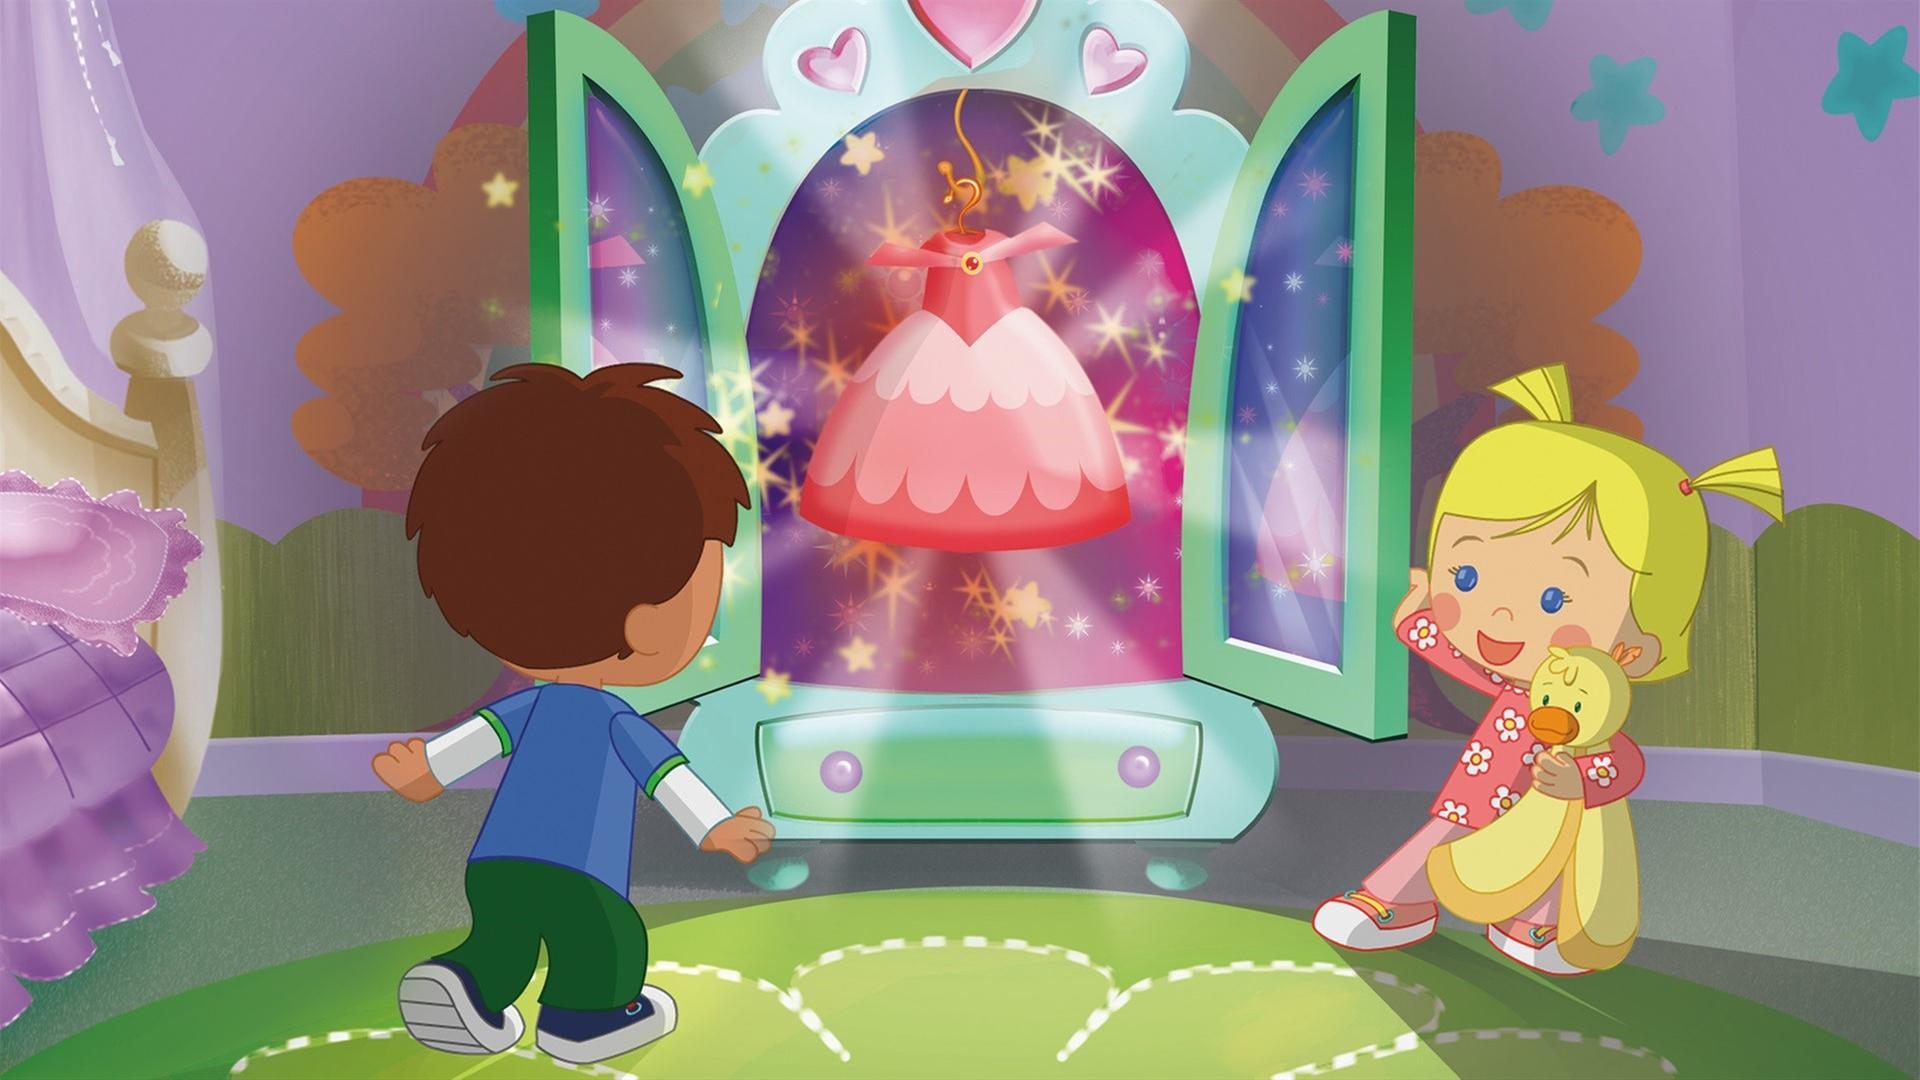 Zoes Zauberschrank Kika